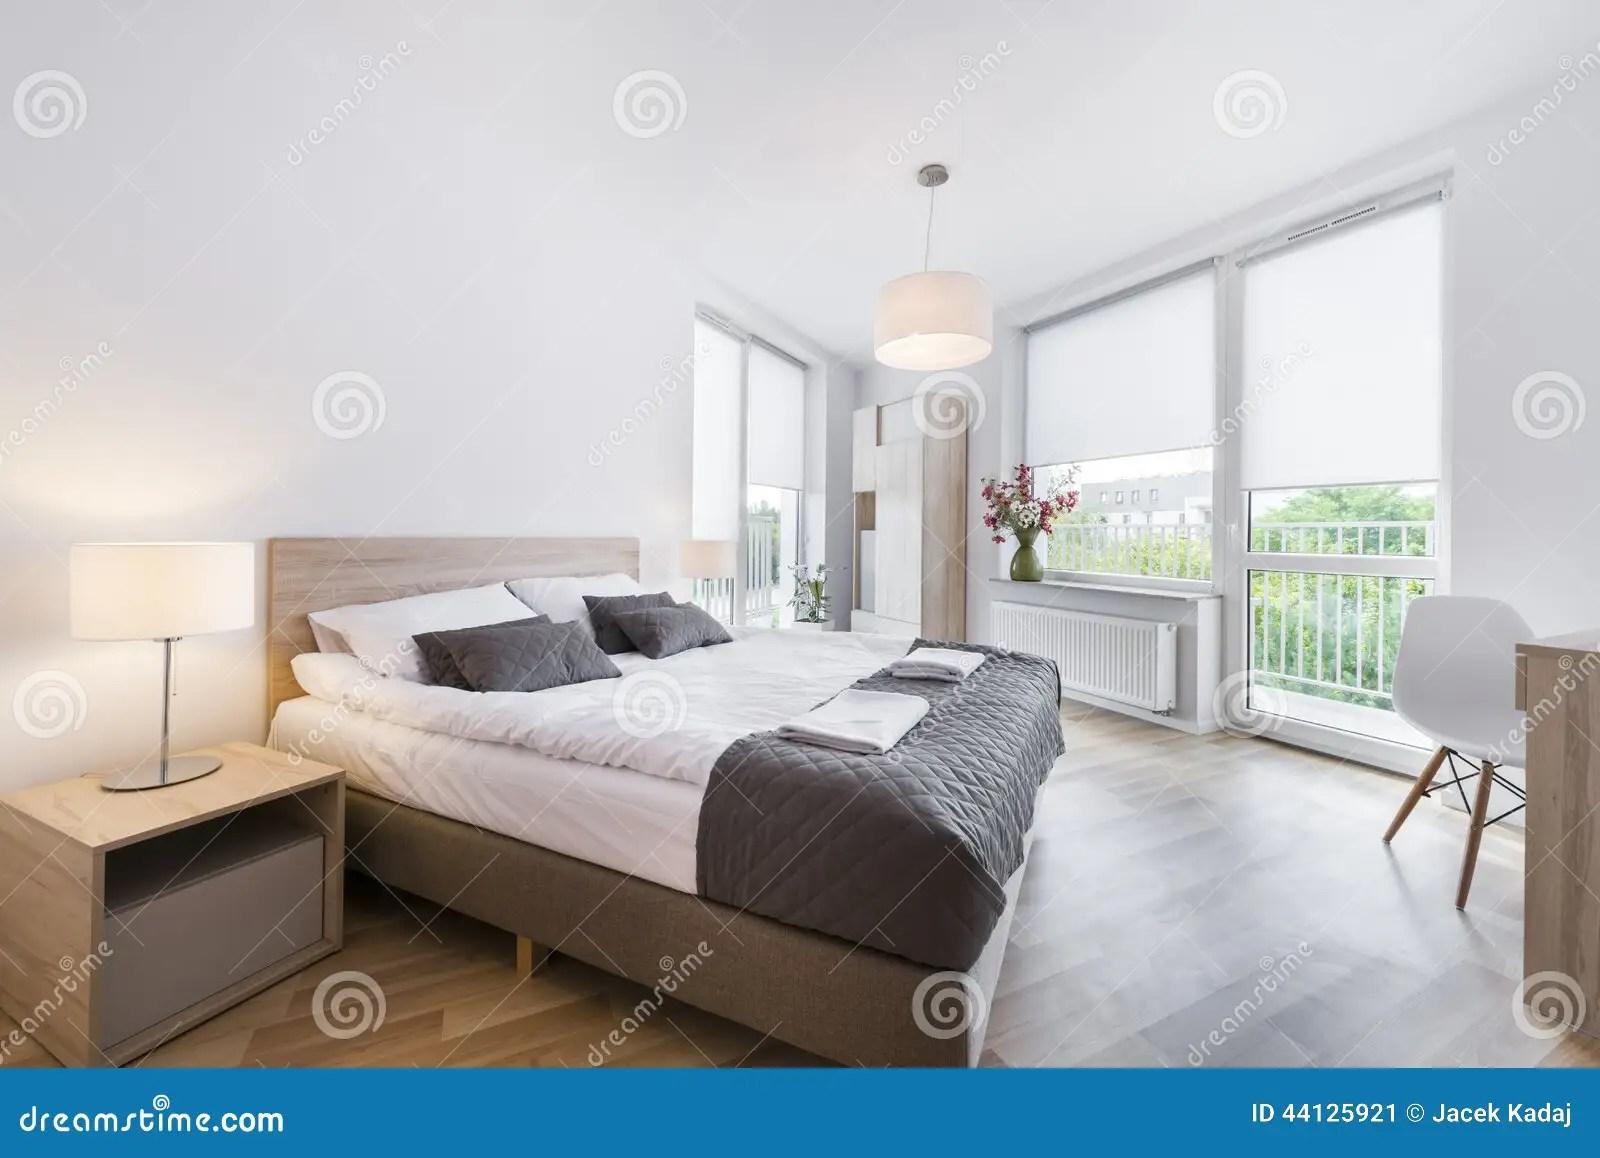 Modern And Comfortable Bedroom Interior Design Stock Image ... on Comfortable Bedroom Ideas  id=25296